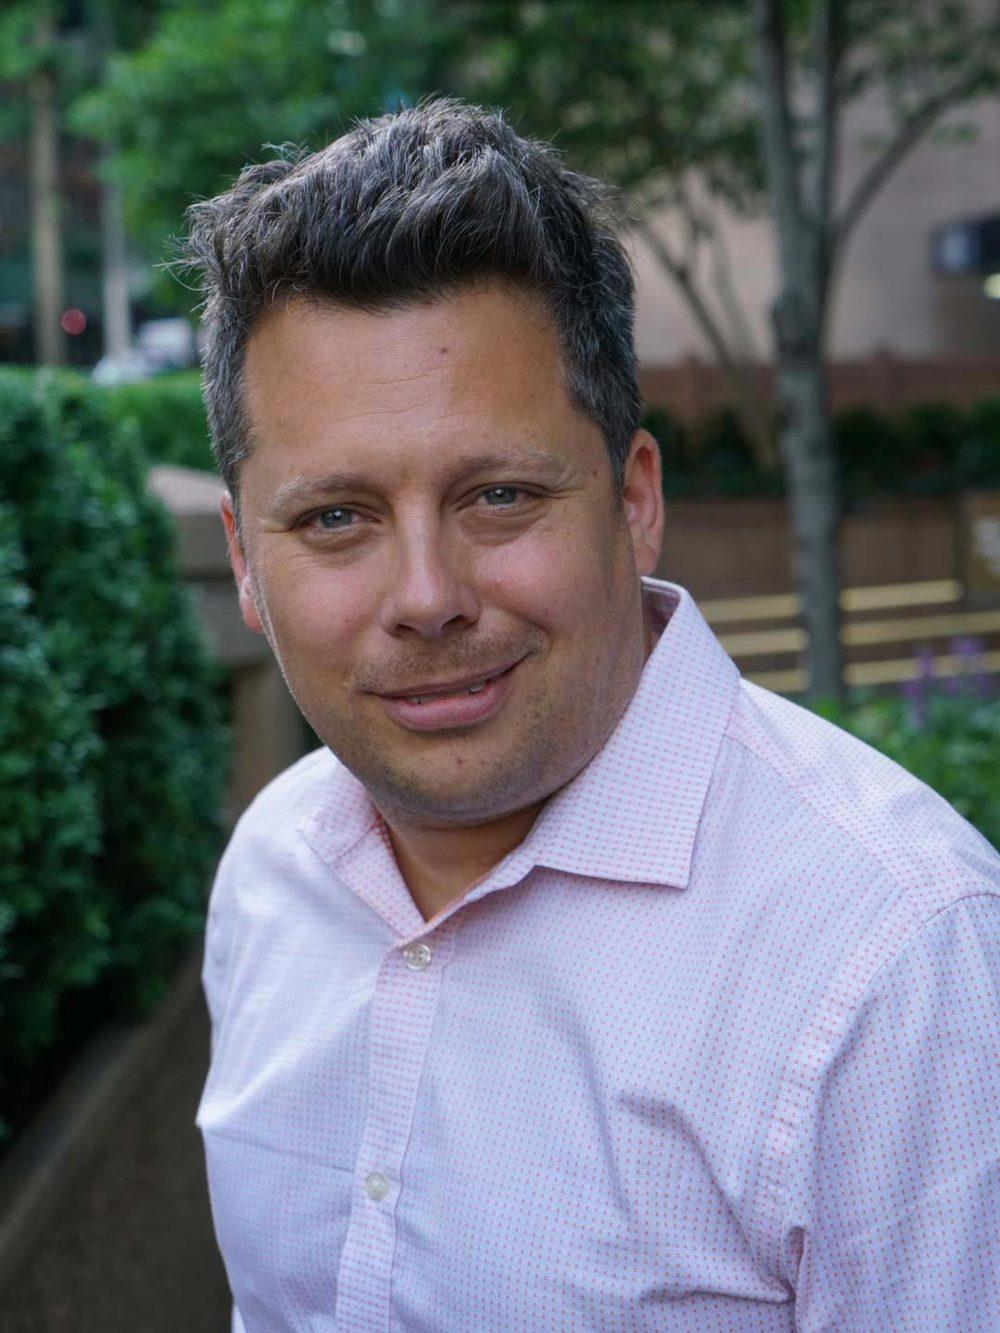 Designer and Real Estate Agent Zack Sosne